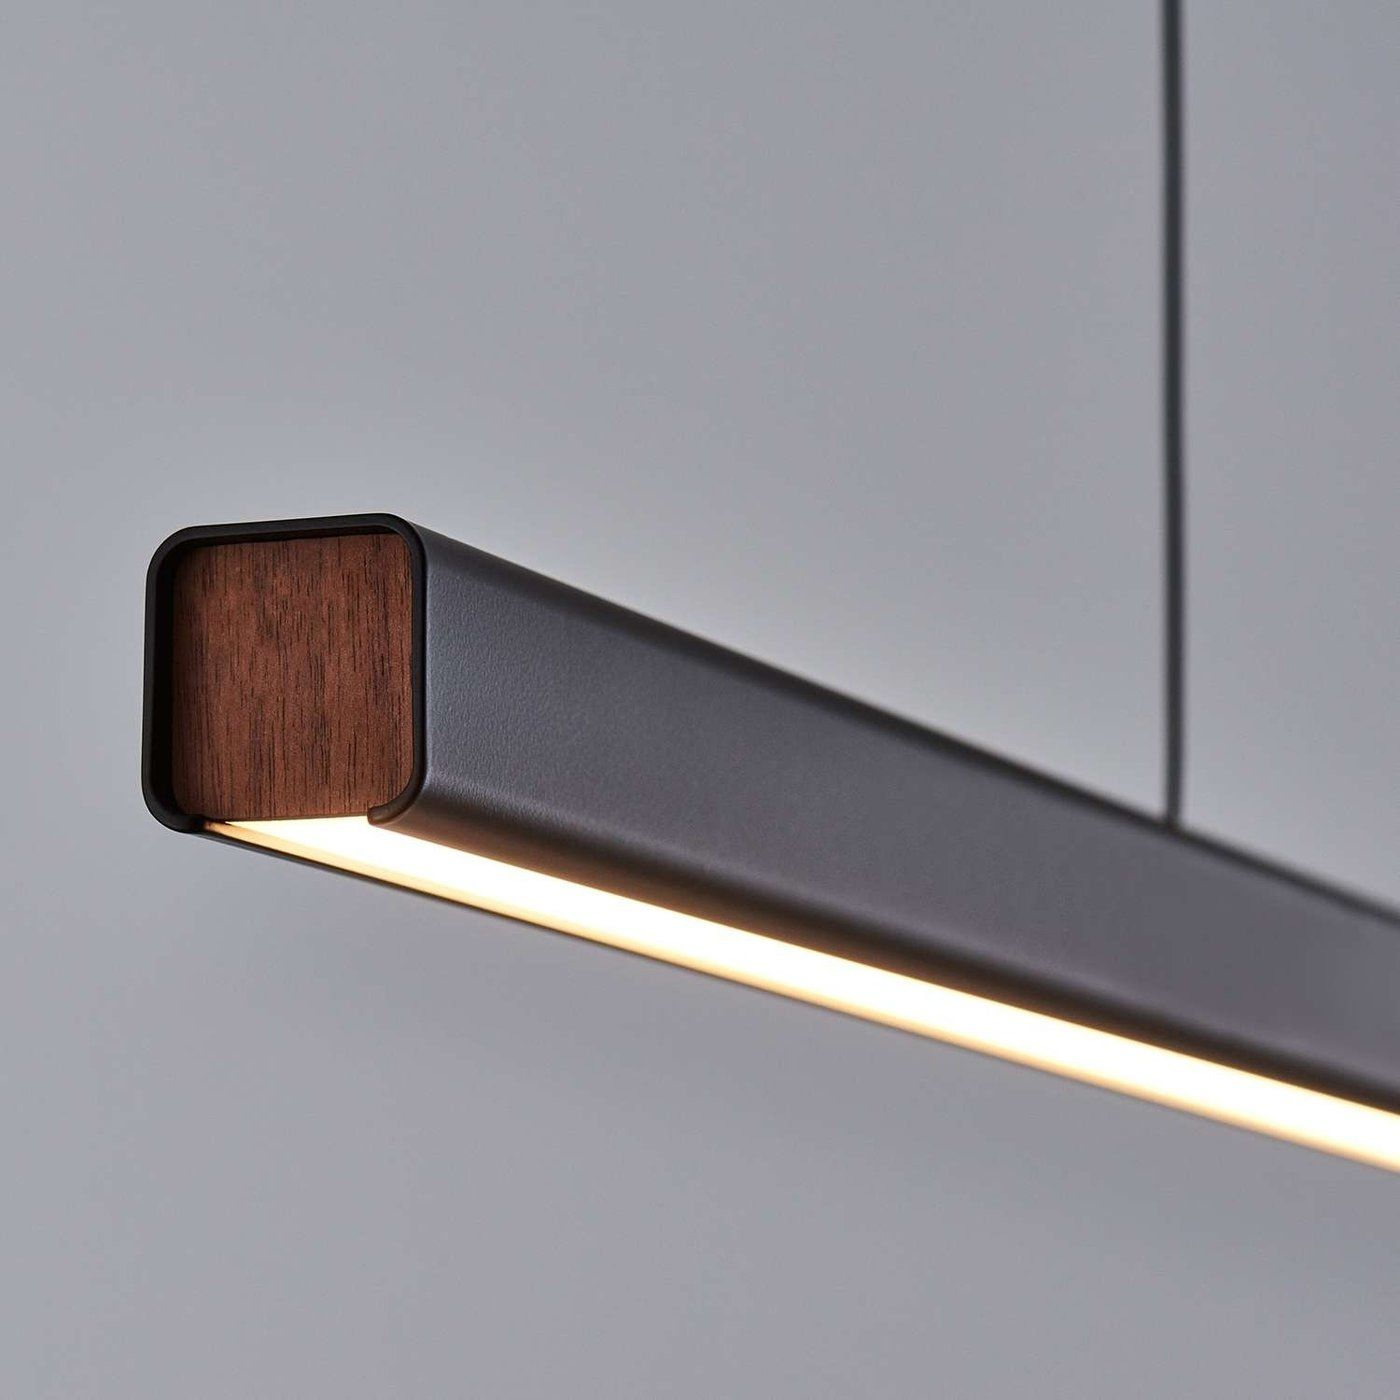 seed design mumu led linear suspension 32 watt 2150 lumen - Suspension Design Led